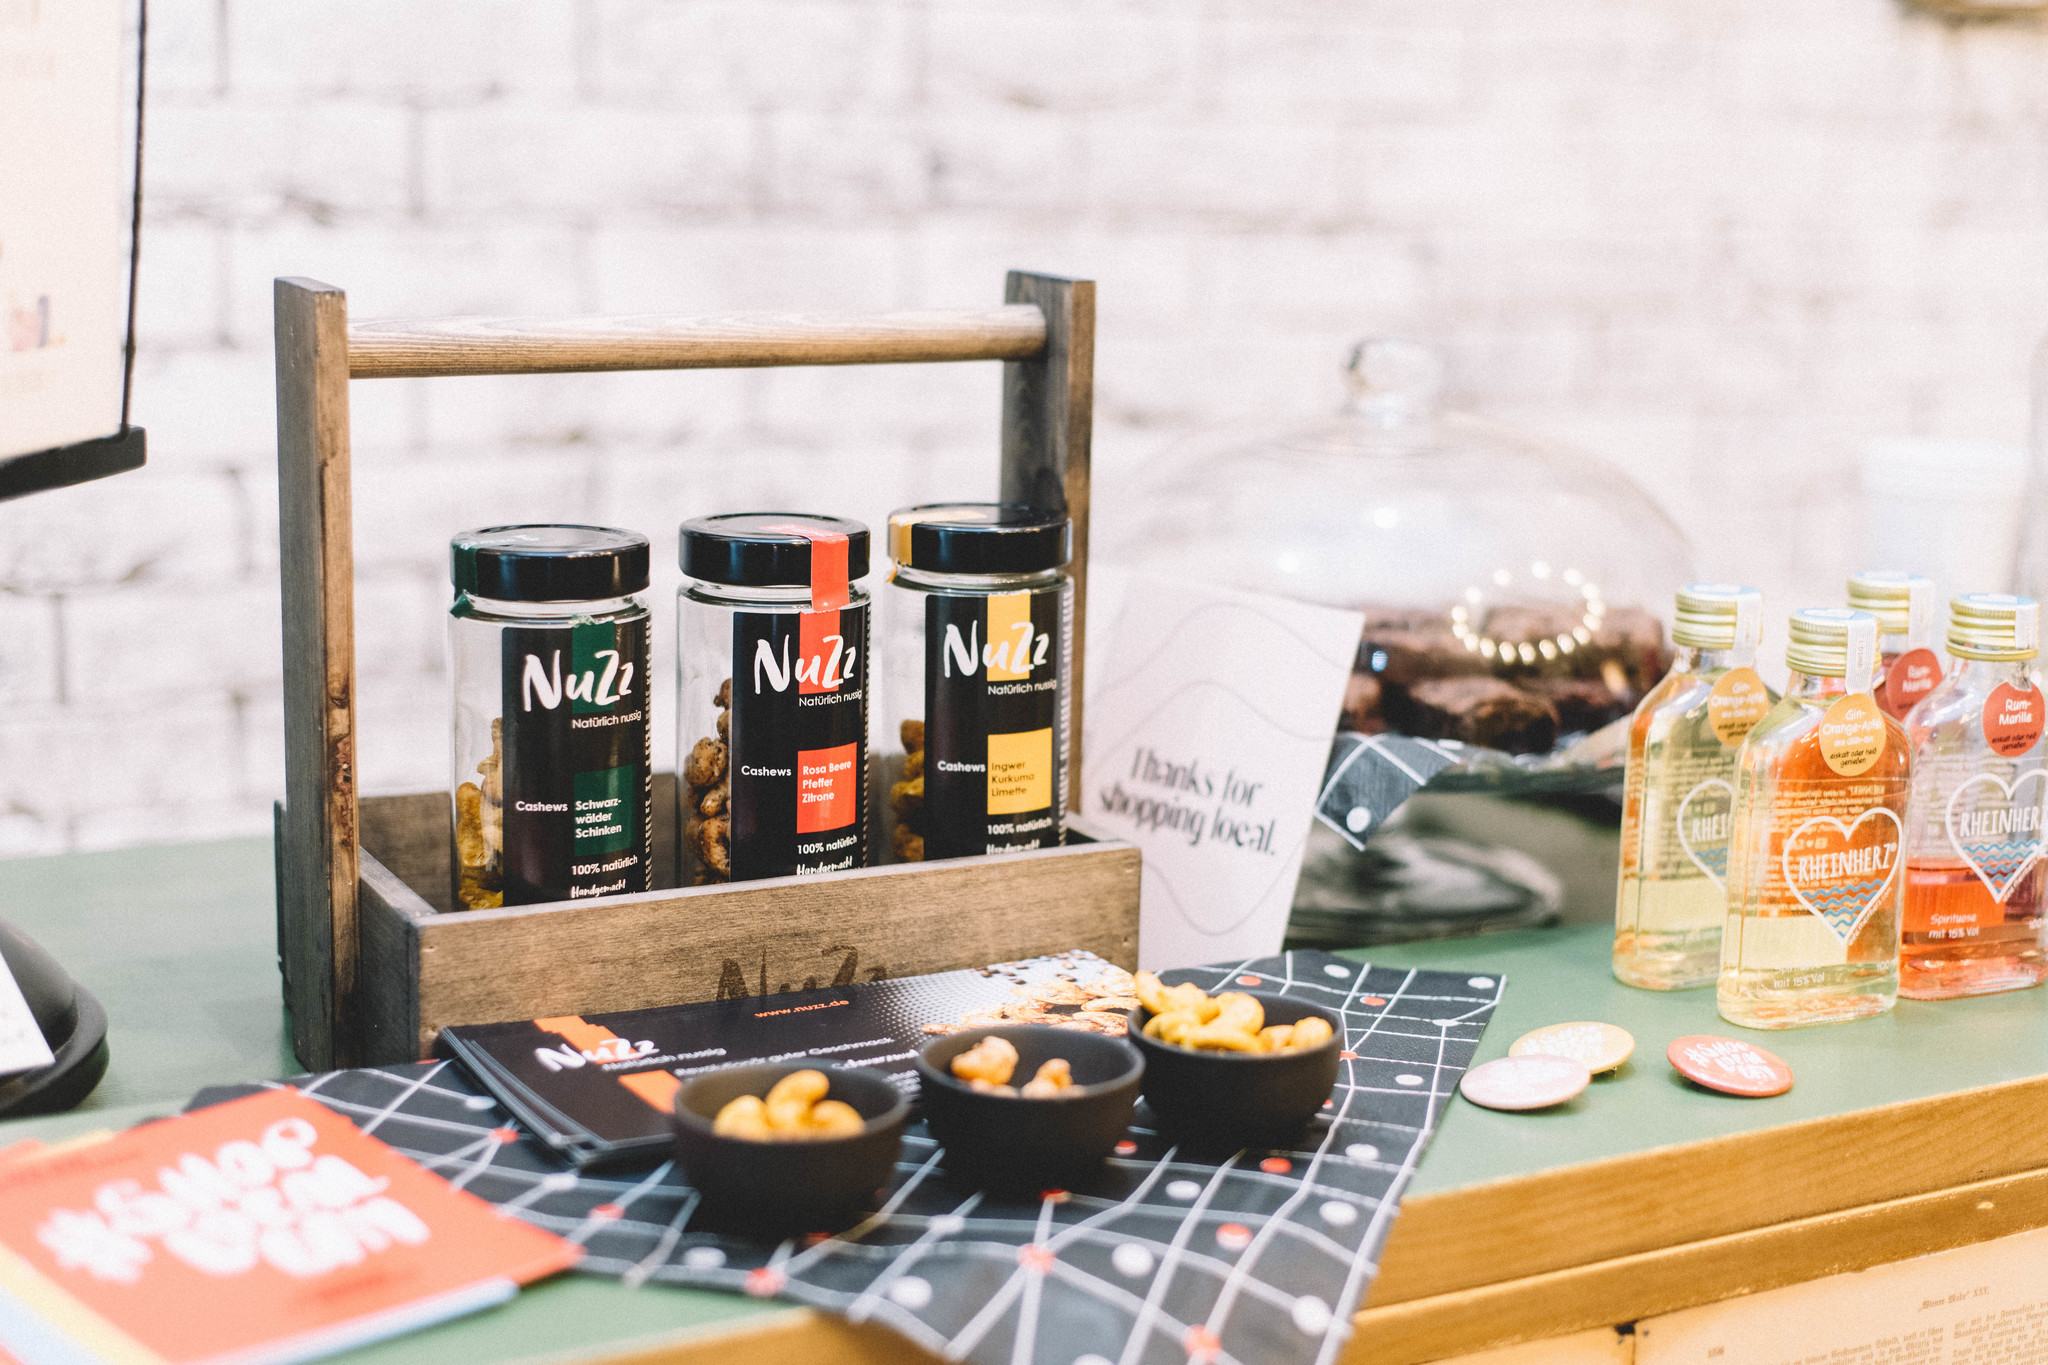 NuZz Shop Local Day